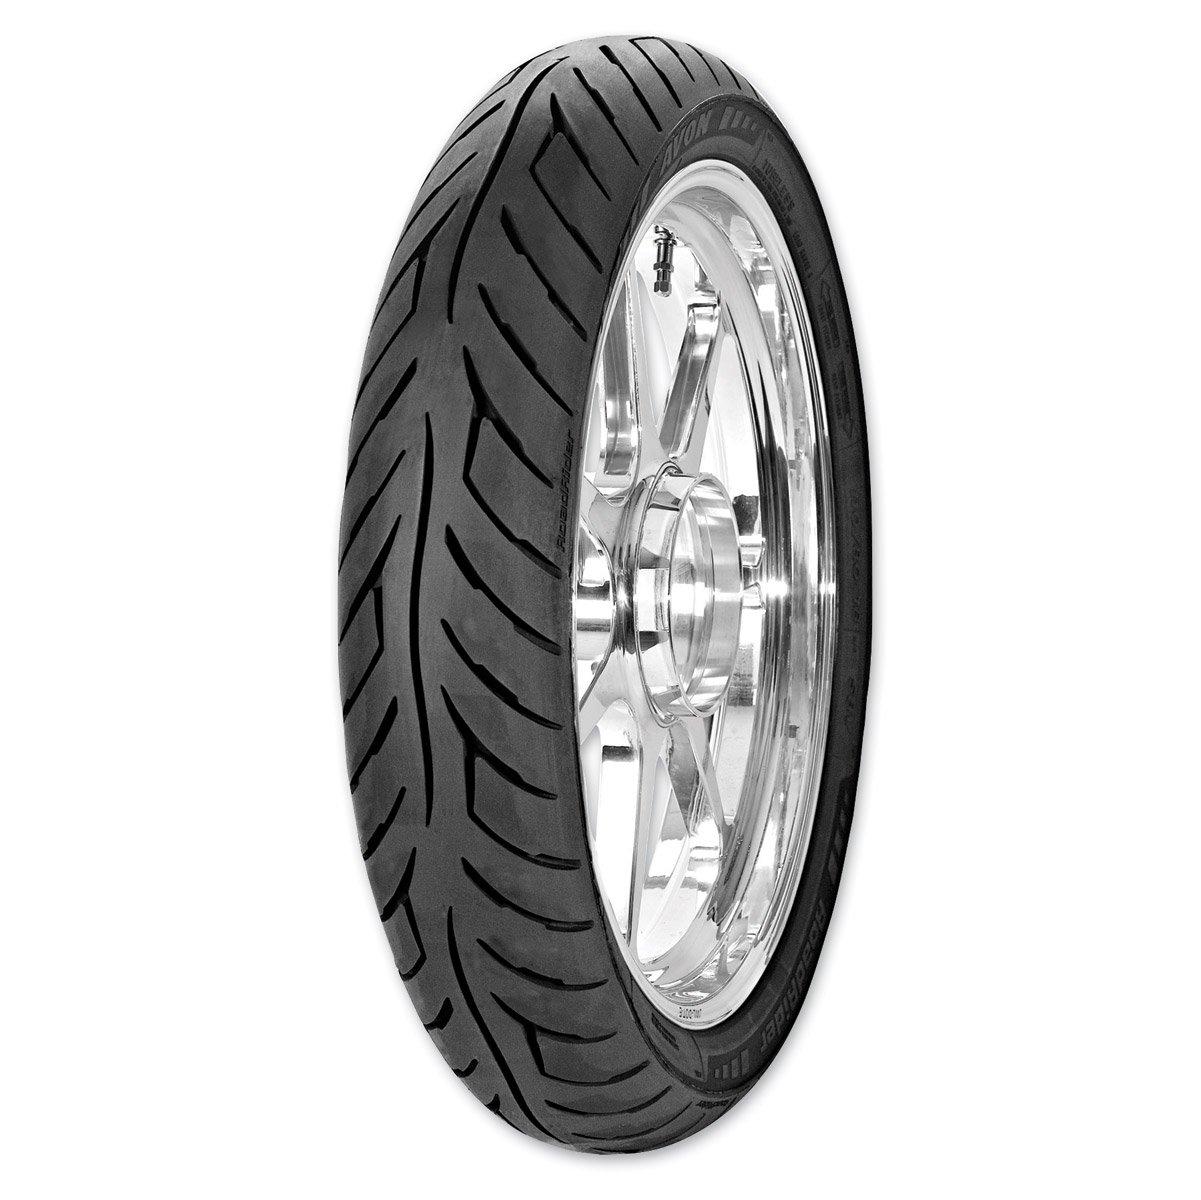 Avon Tire RoadRider Front/Rear Tire (90/90-18) 4333046528